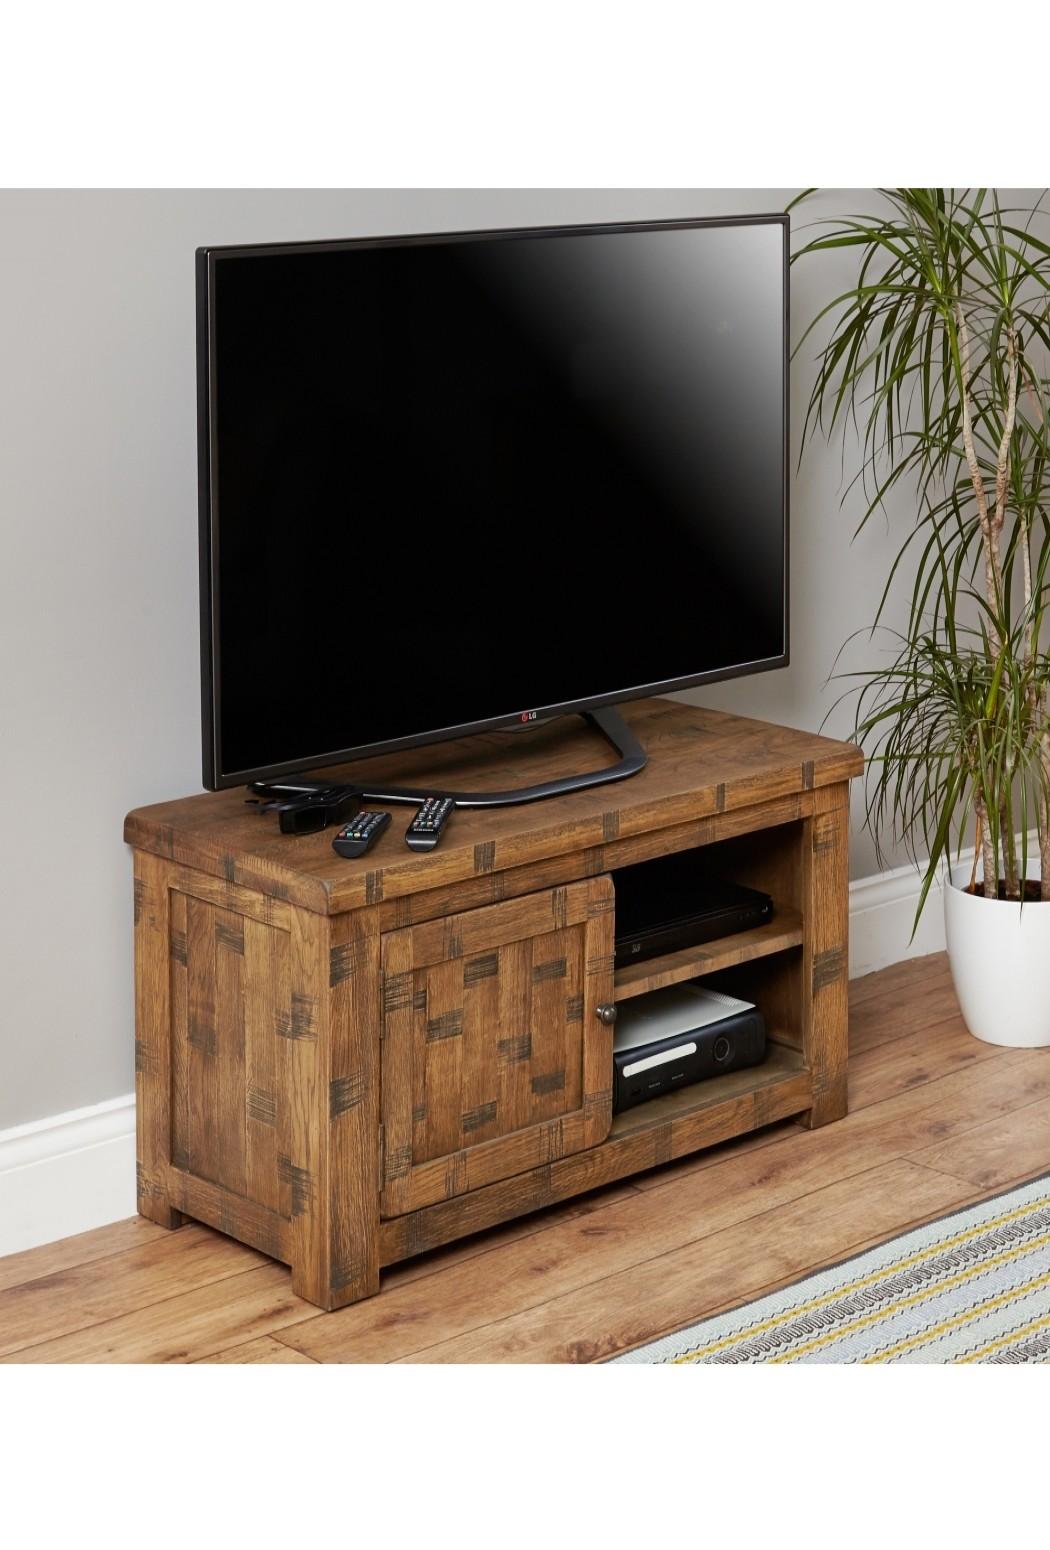 Tv stand baumhaus heyford rough sawn oak crs09a 121 tv Oak tv stands